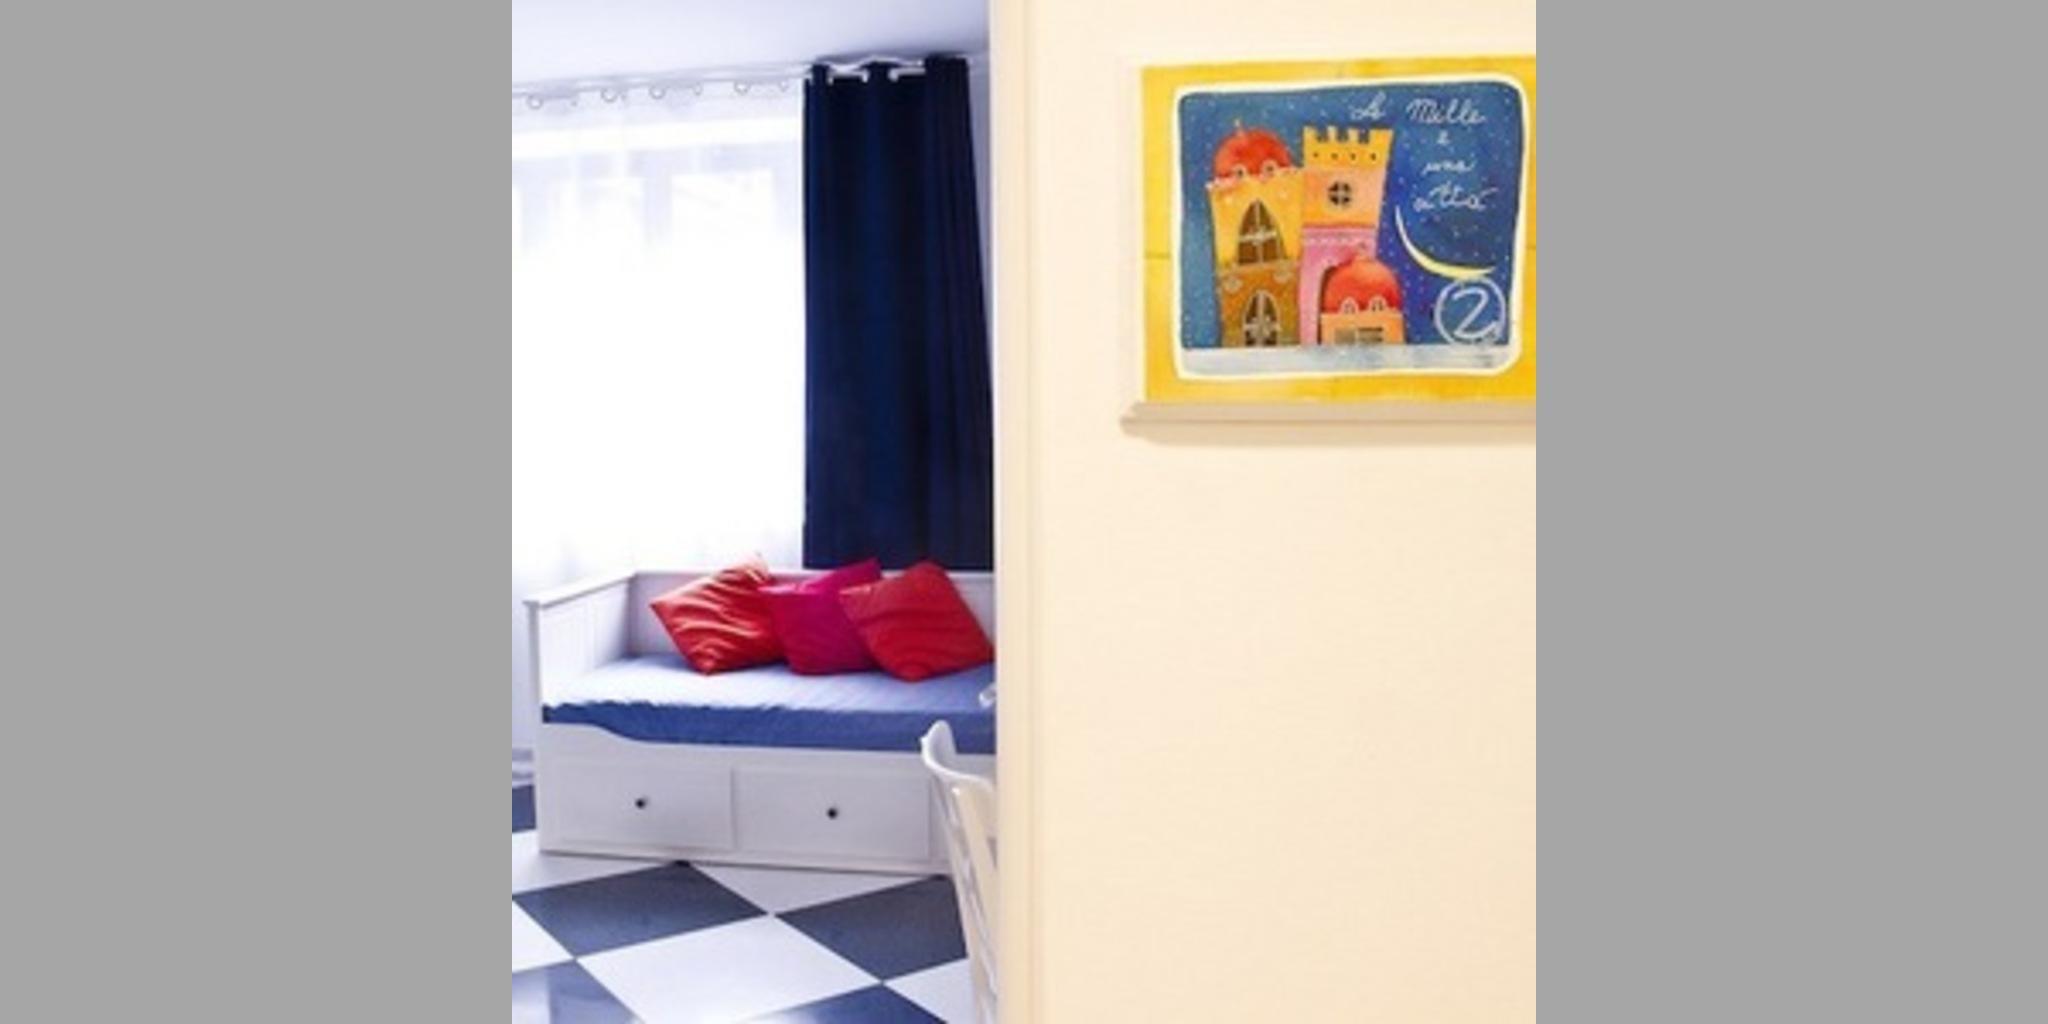 Bed & Breakfast Palermo - Grazioso Zona Politeama